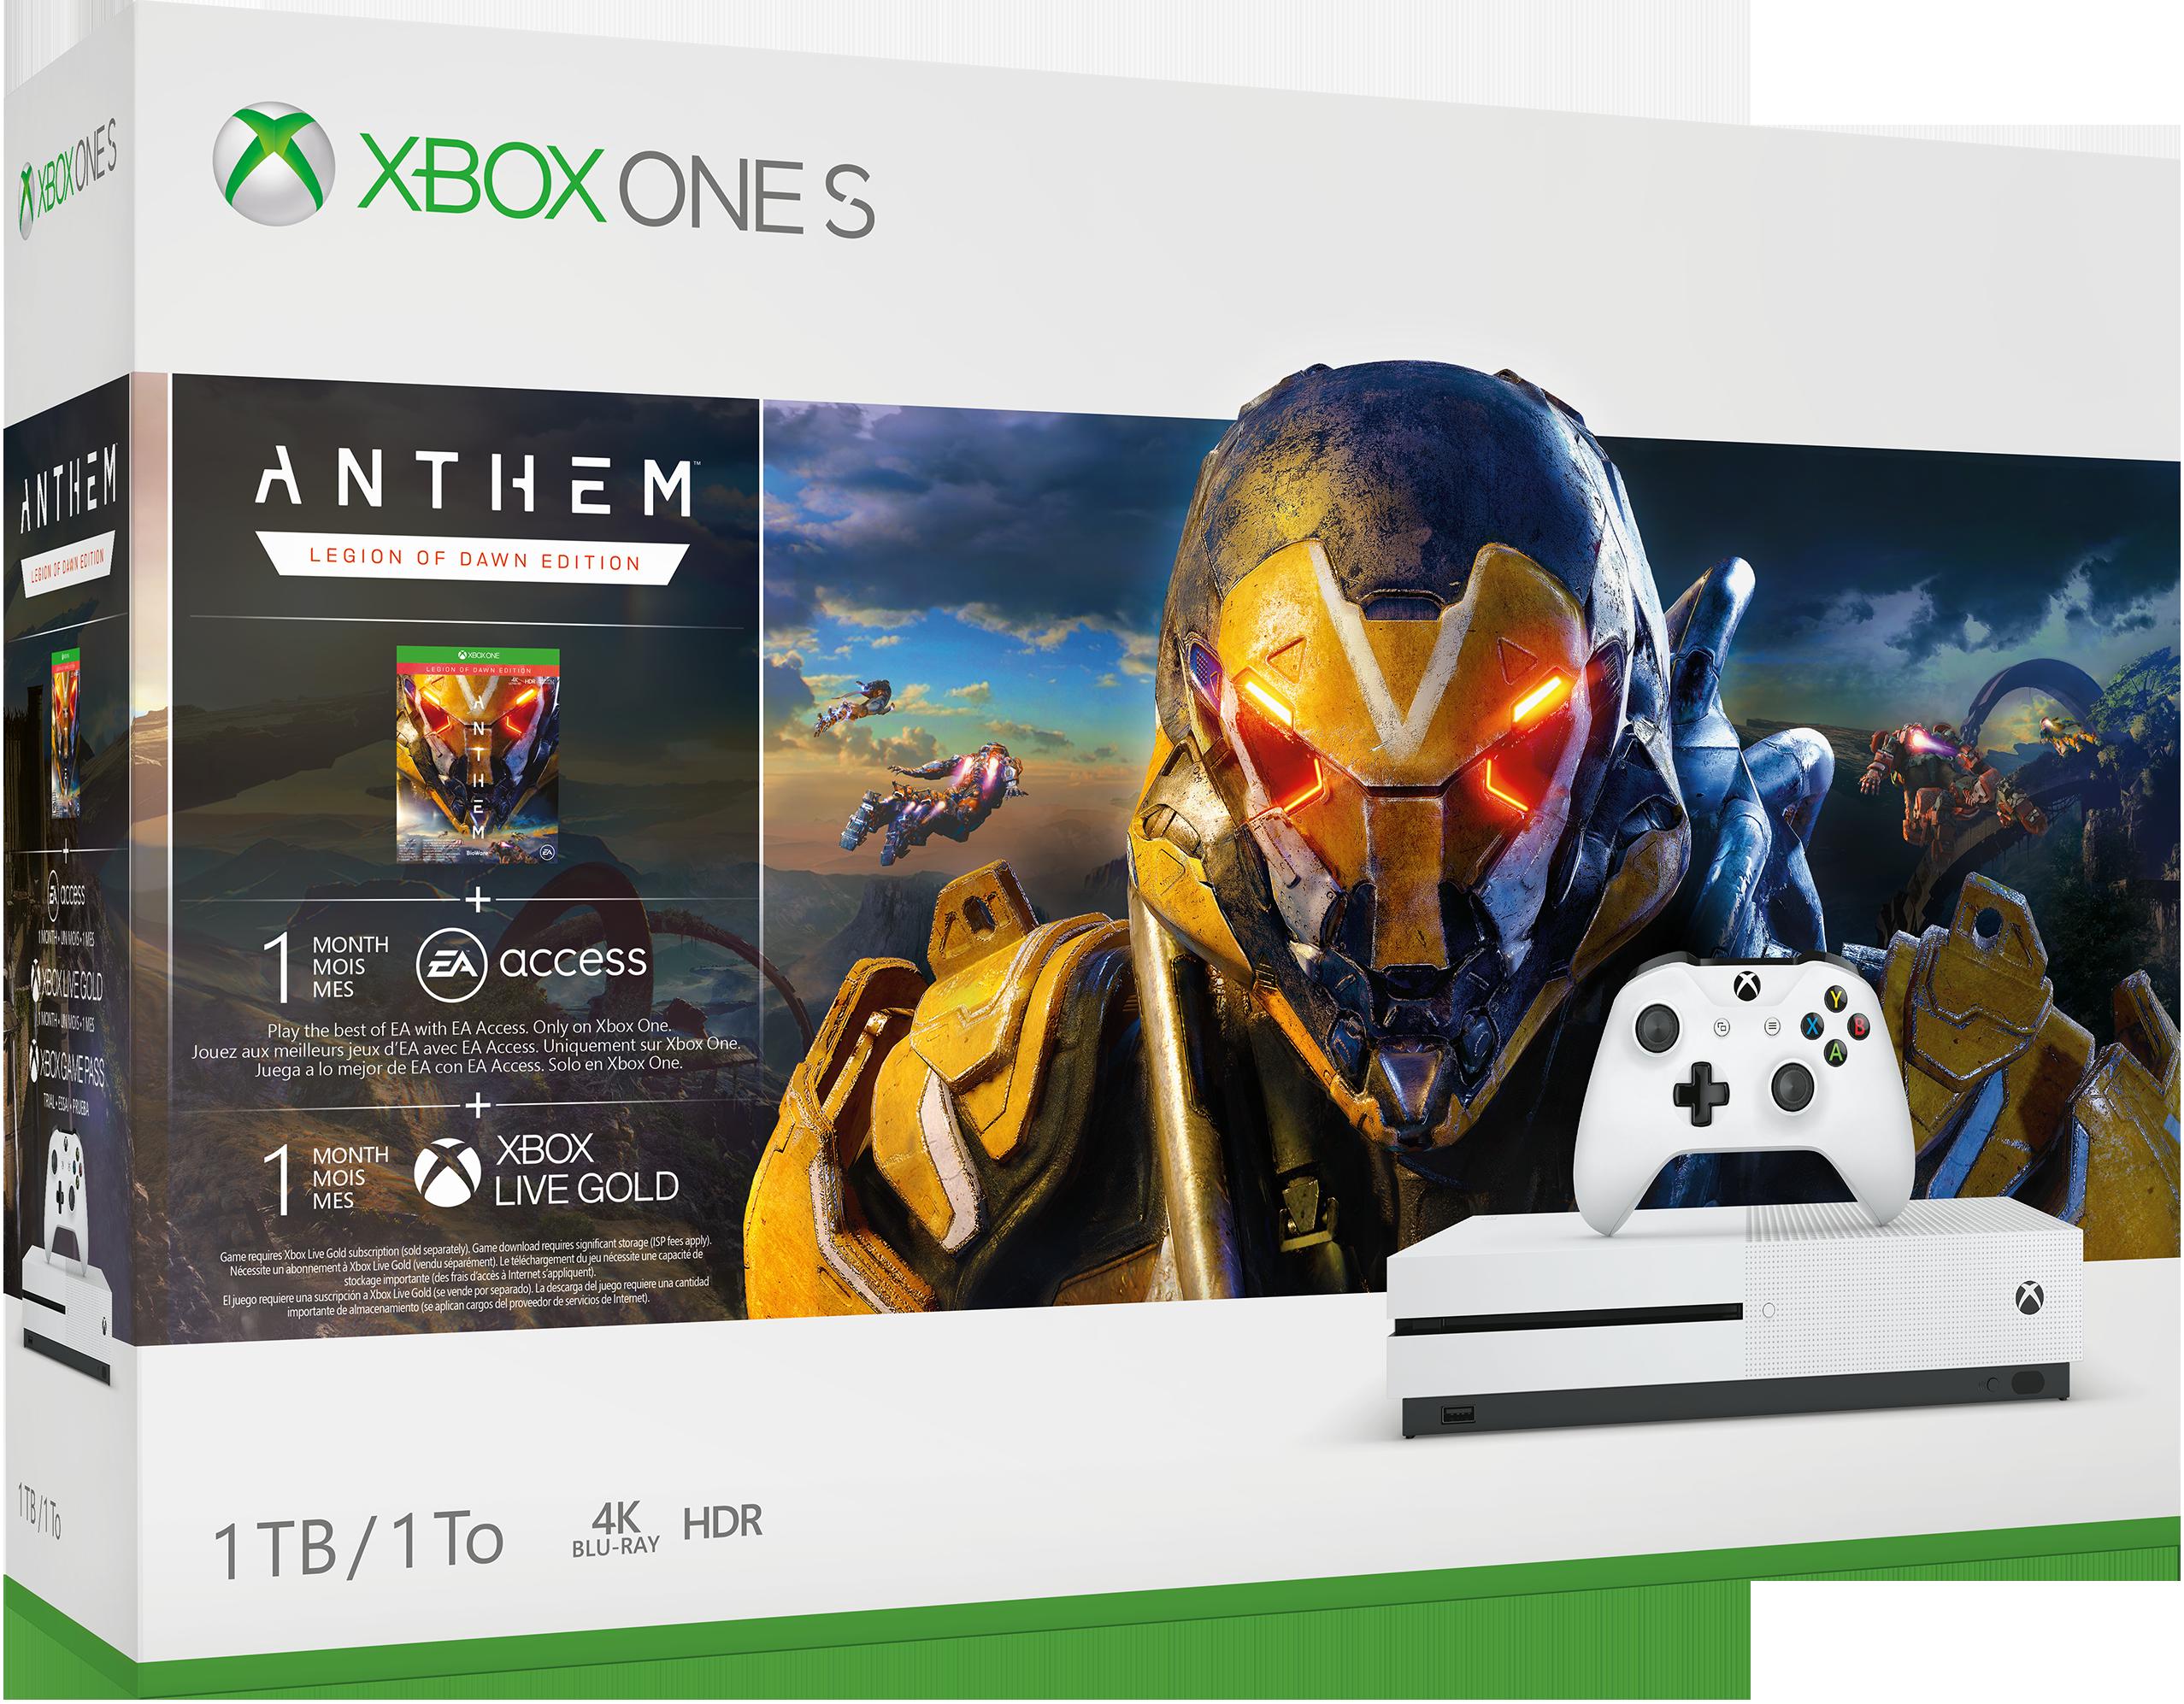 Xbox One S bundle box art